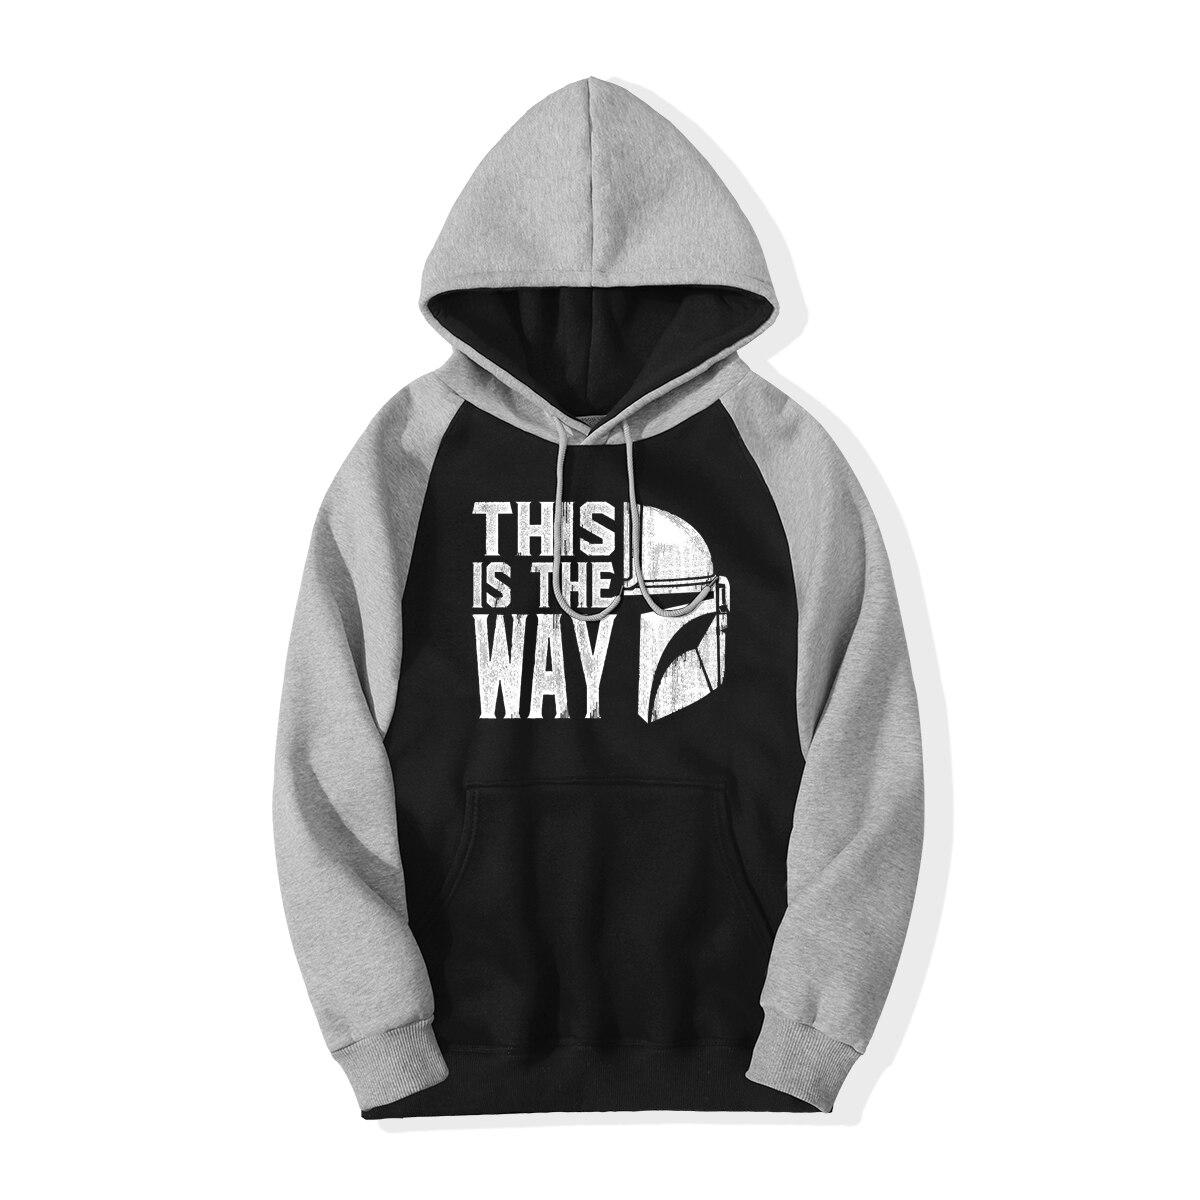 TV Show The Mandalorian Way Men Sweatshirts Hoodie 2019 Winter Star Wars This Is My Way Hooded Fleece Raglan Hoodie Pullover